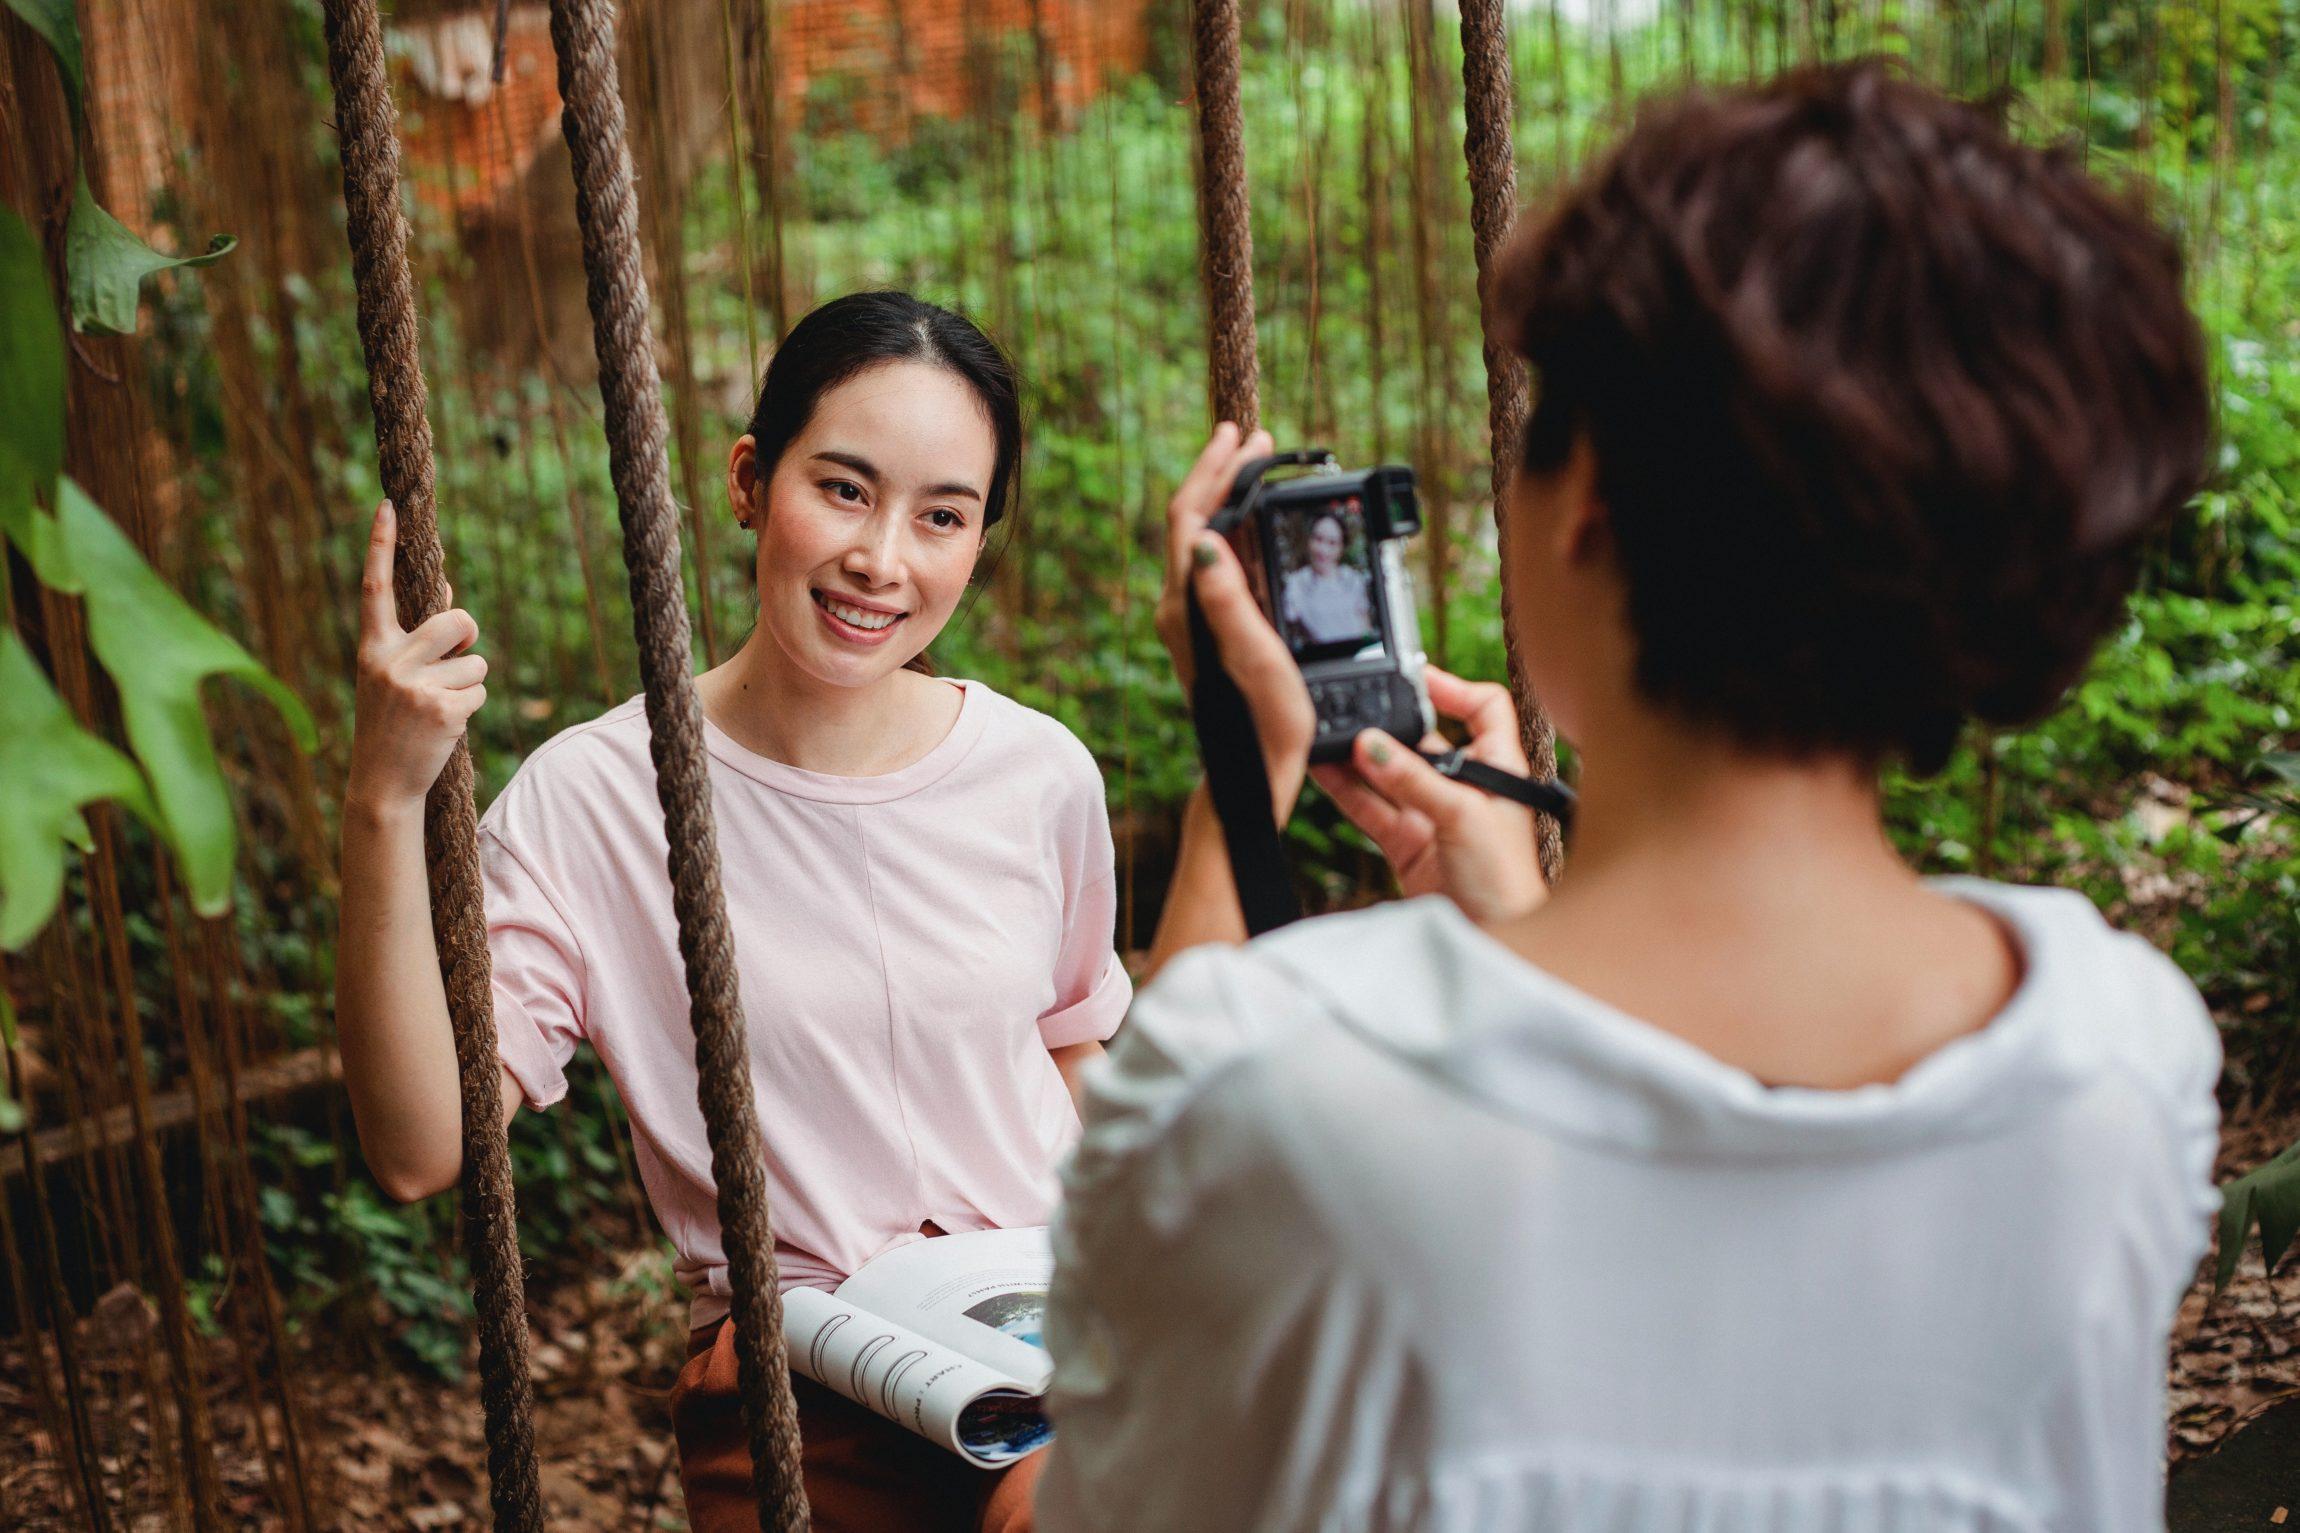 Photographer capturing headshot of their subject